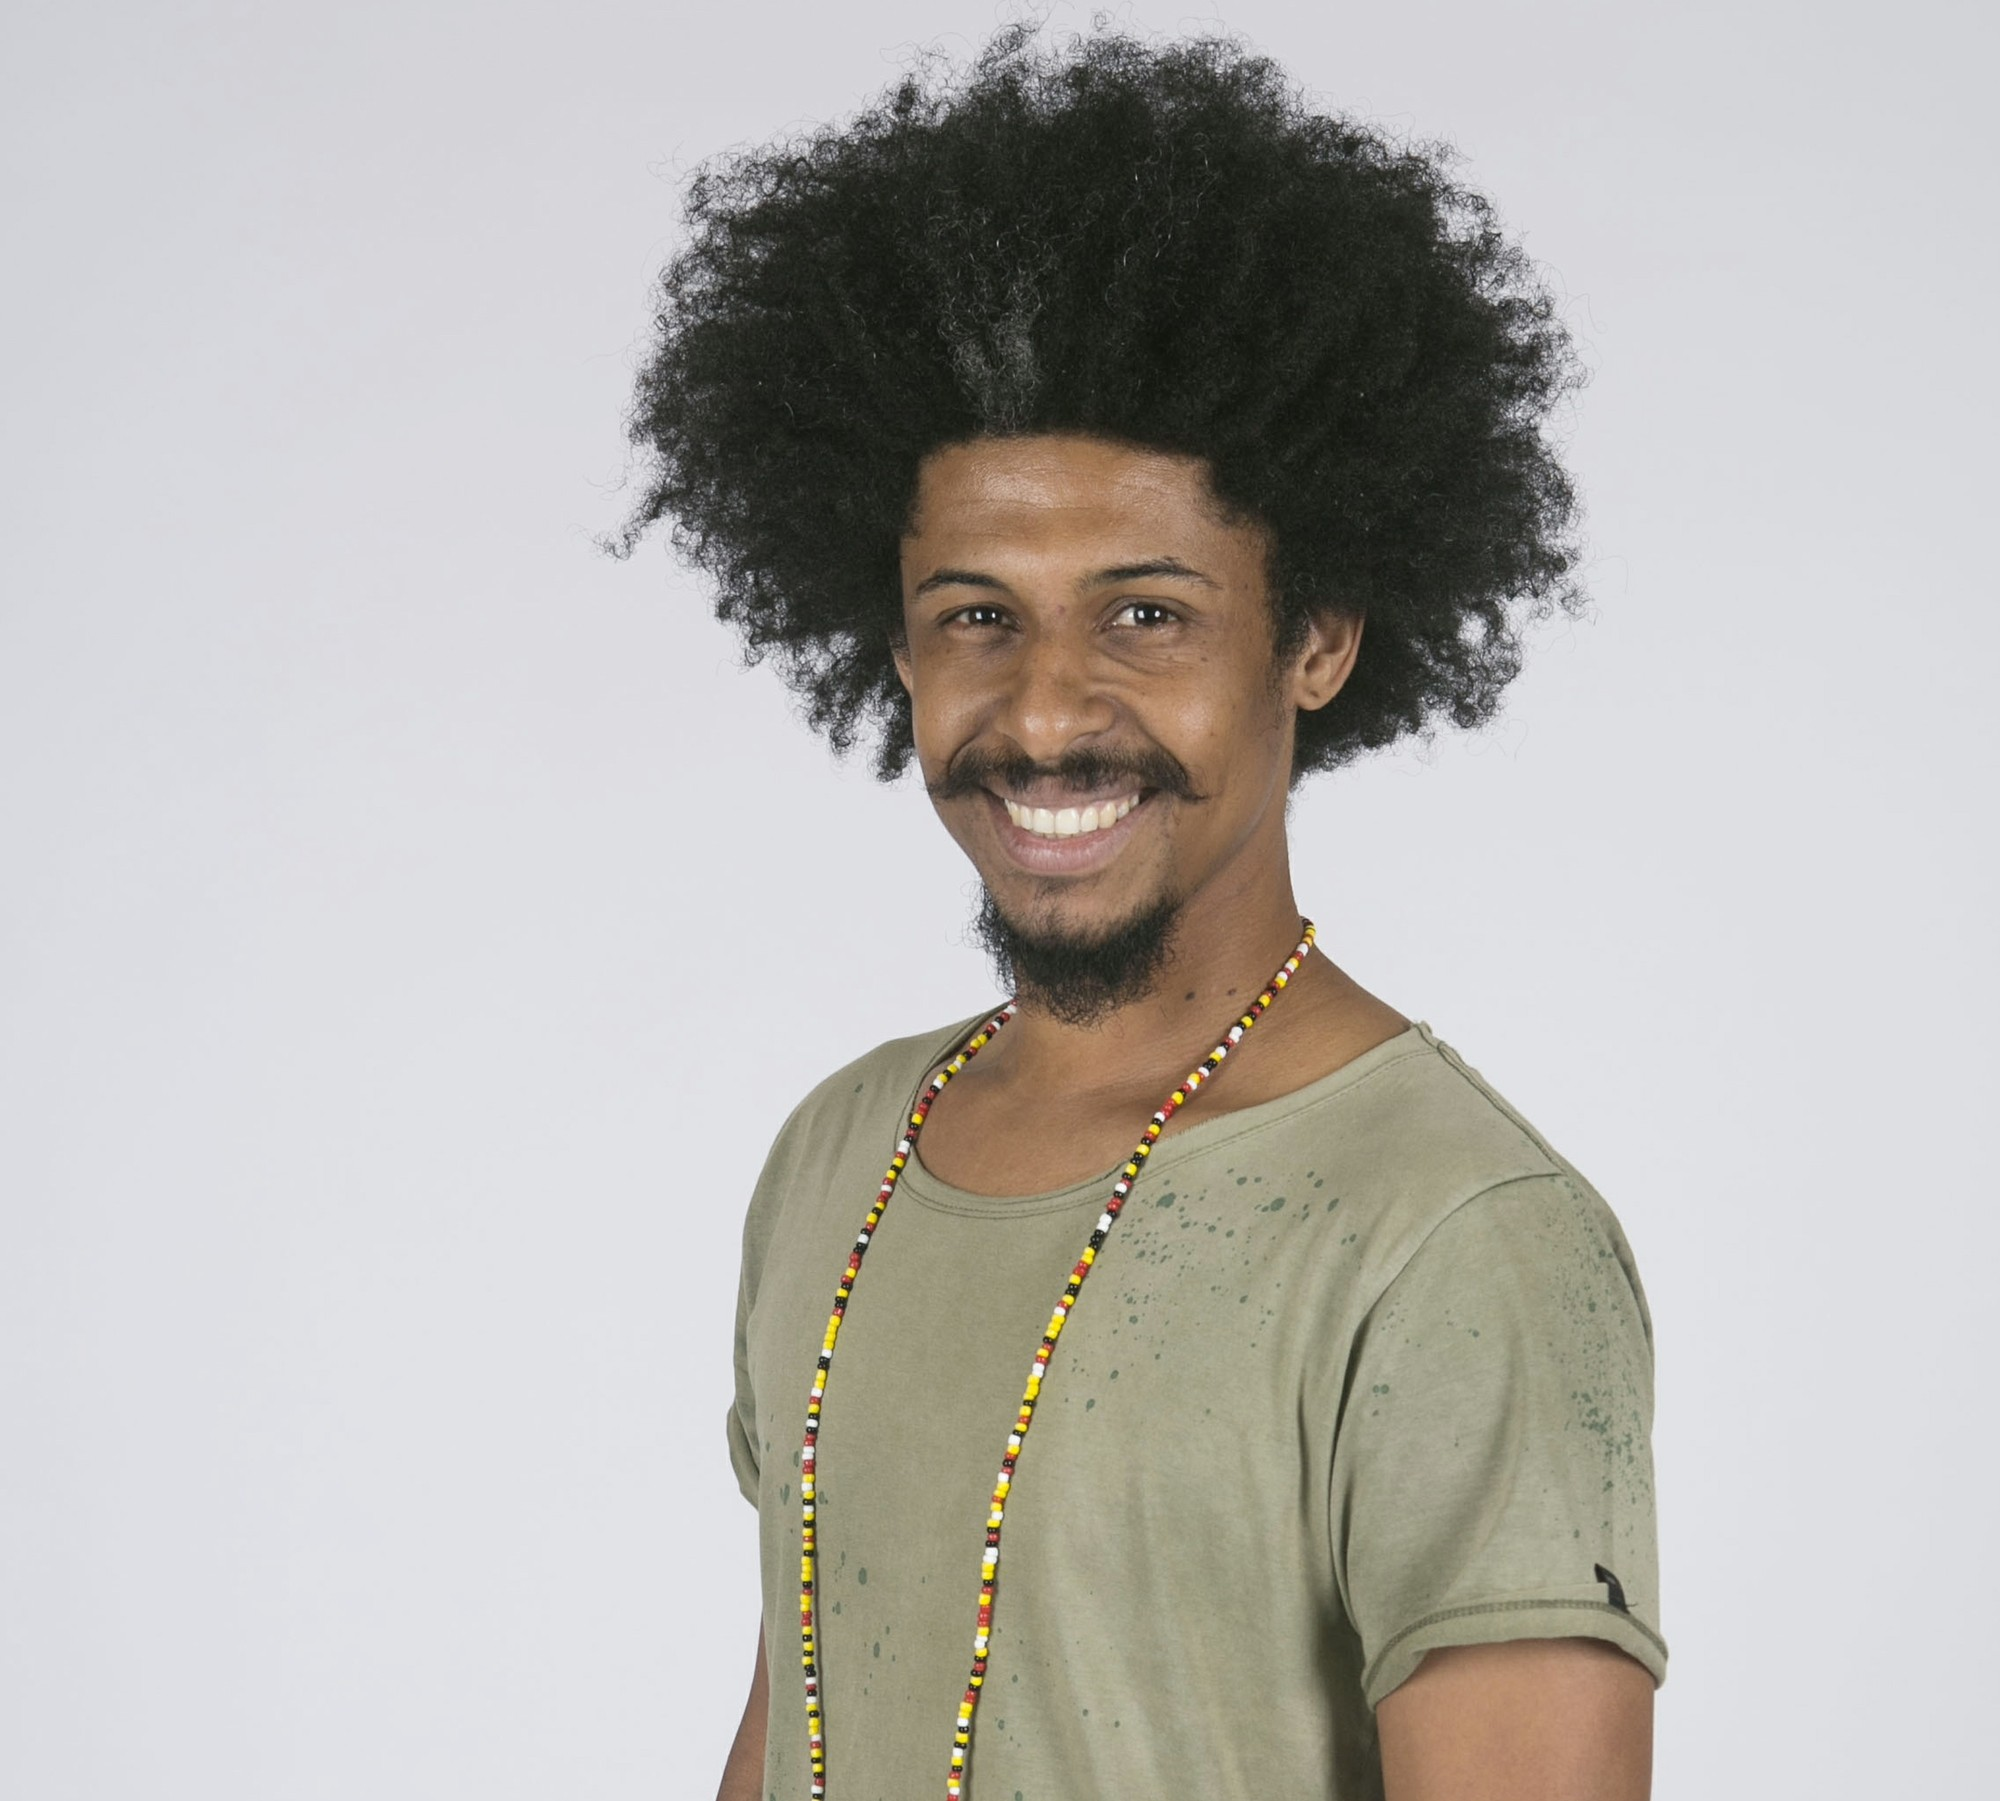 Alexandre Massau